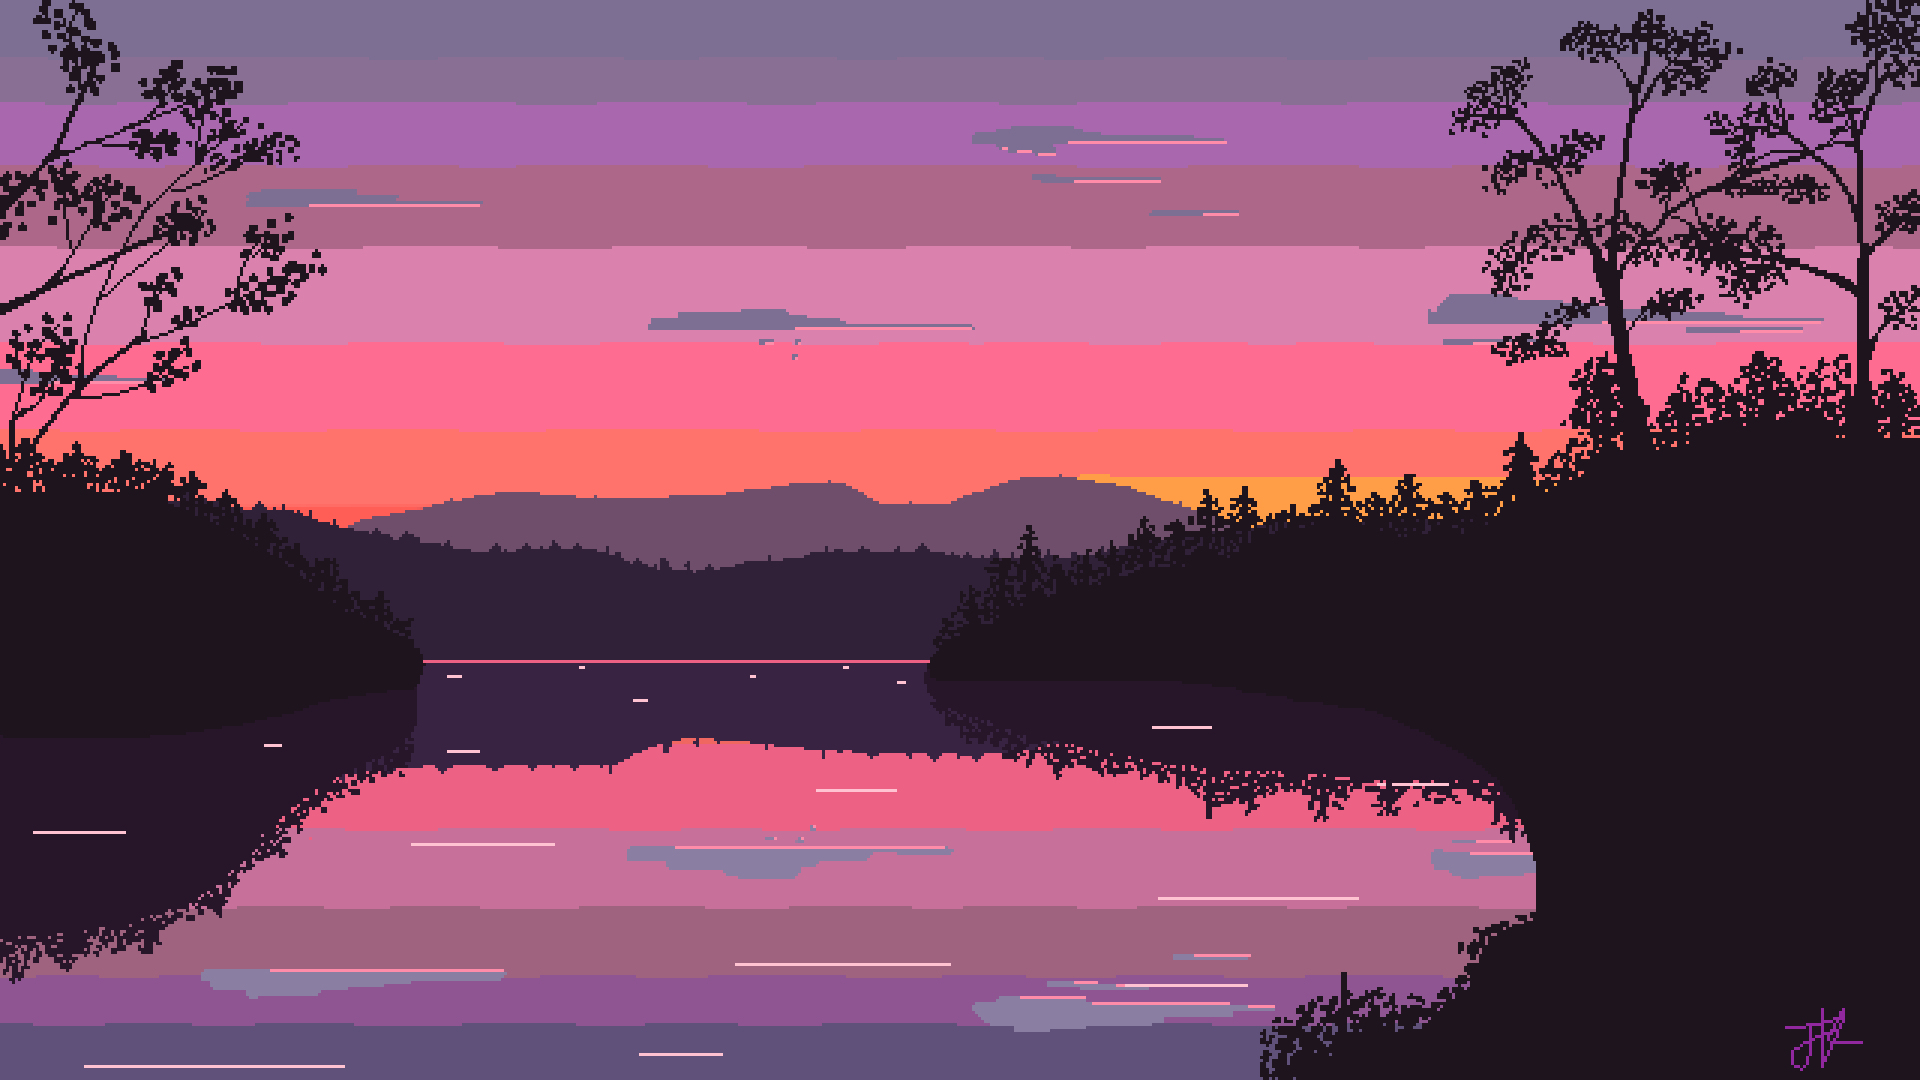 Pixel Art A Manger Impressionnant Photos Morning Lake Pixel Art Need iPhone 6s Plus Wallpaper